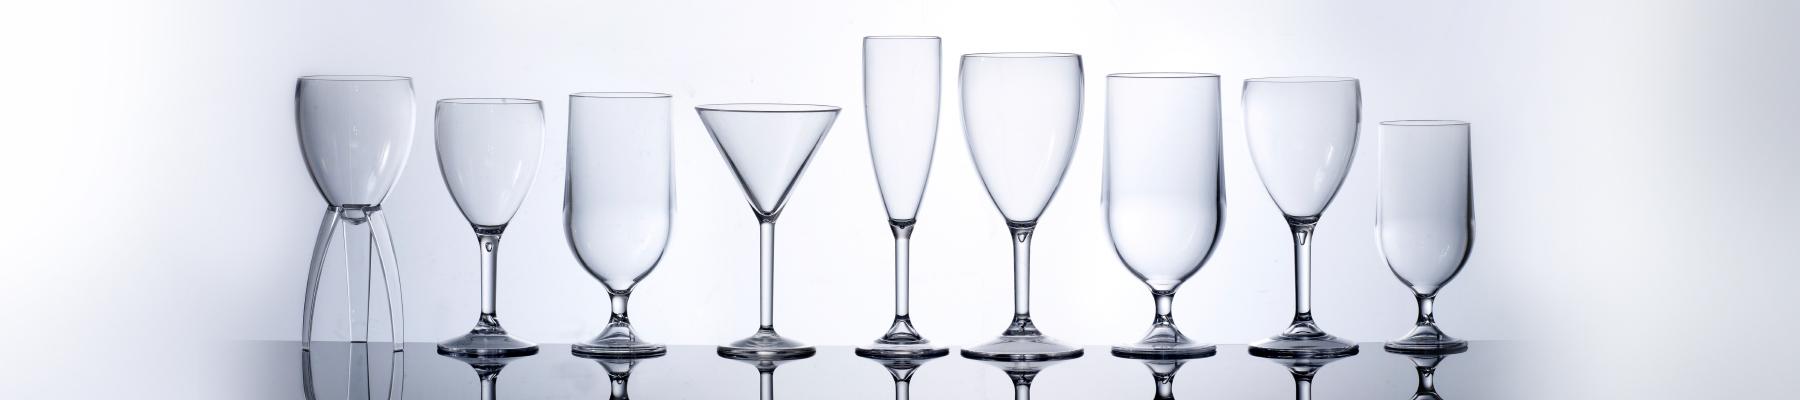 Reusable Plastic Wine Glasses